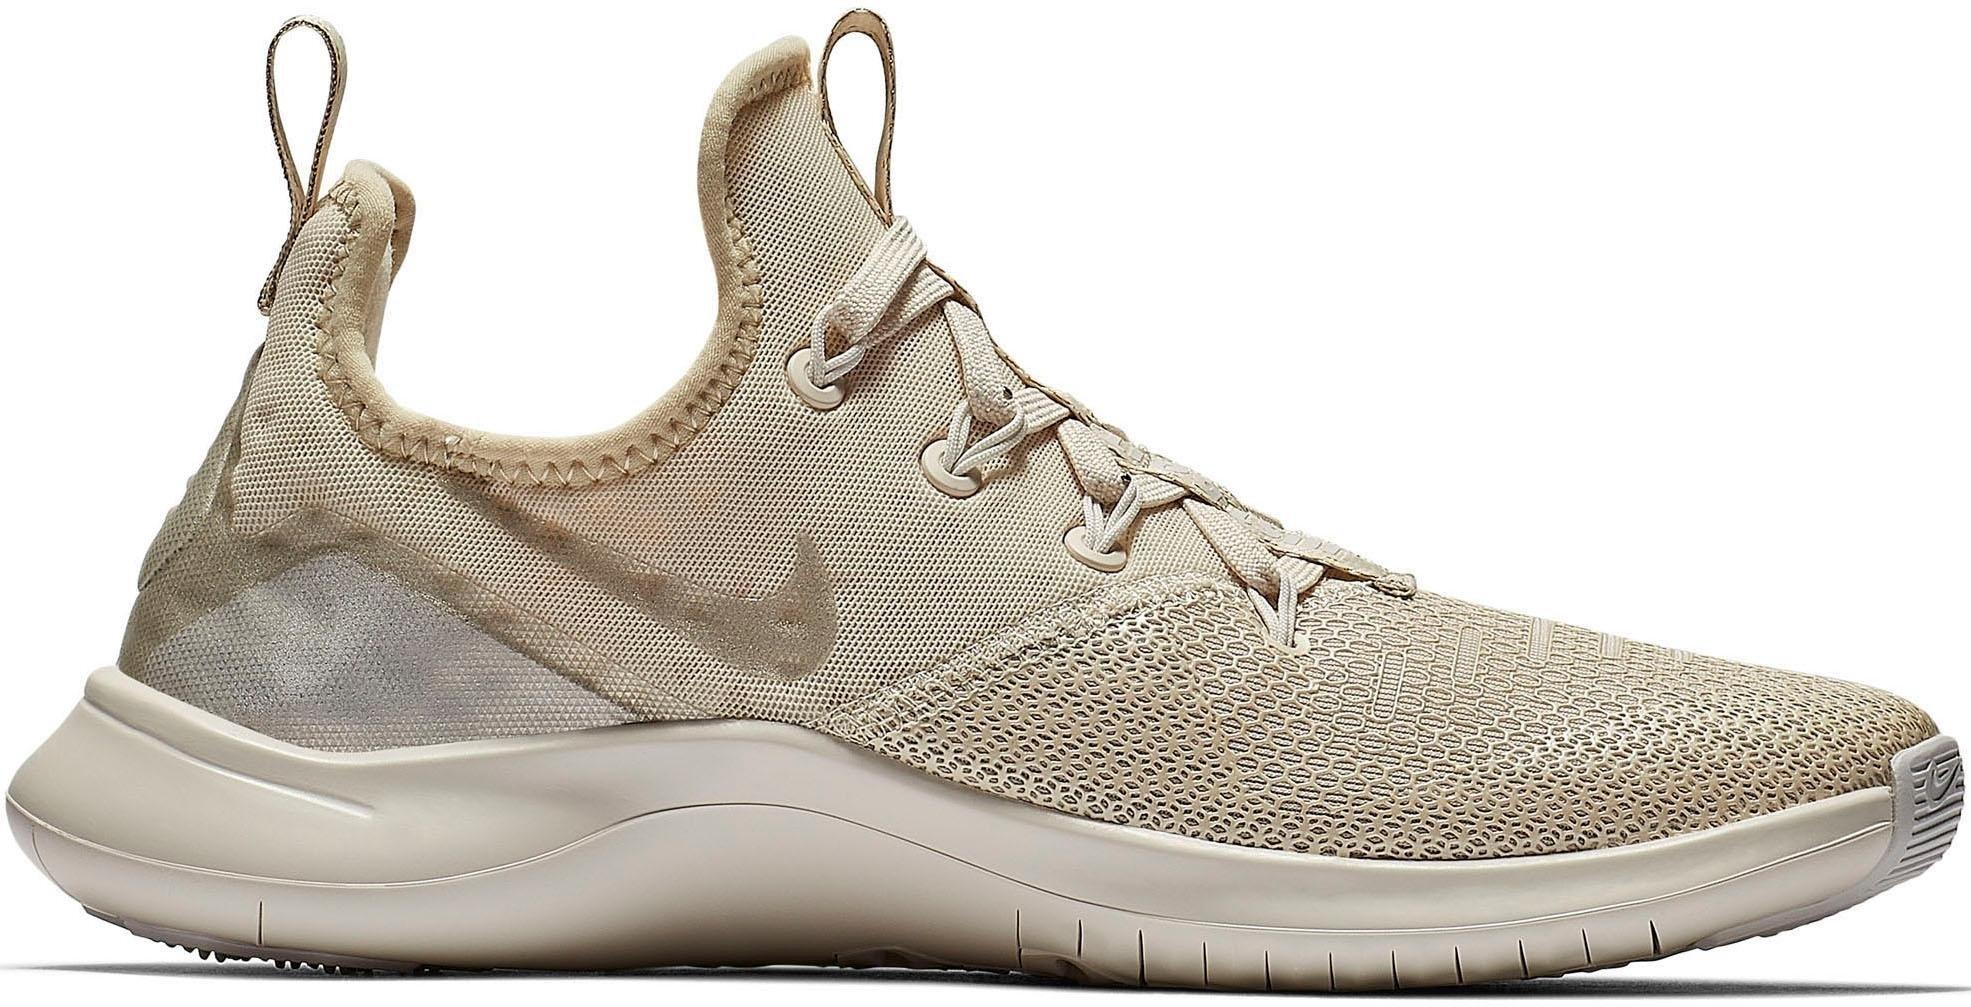 Nike Bij Tr Bestellen Fitnessschoenenwmns Champagne Free 8 6I7vgYbfy